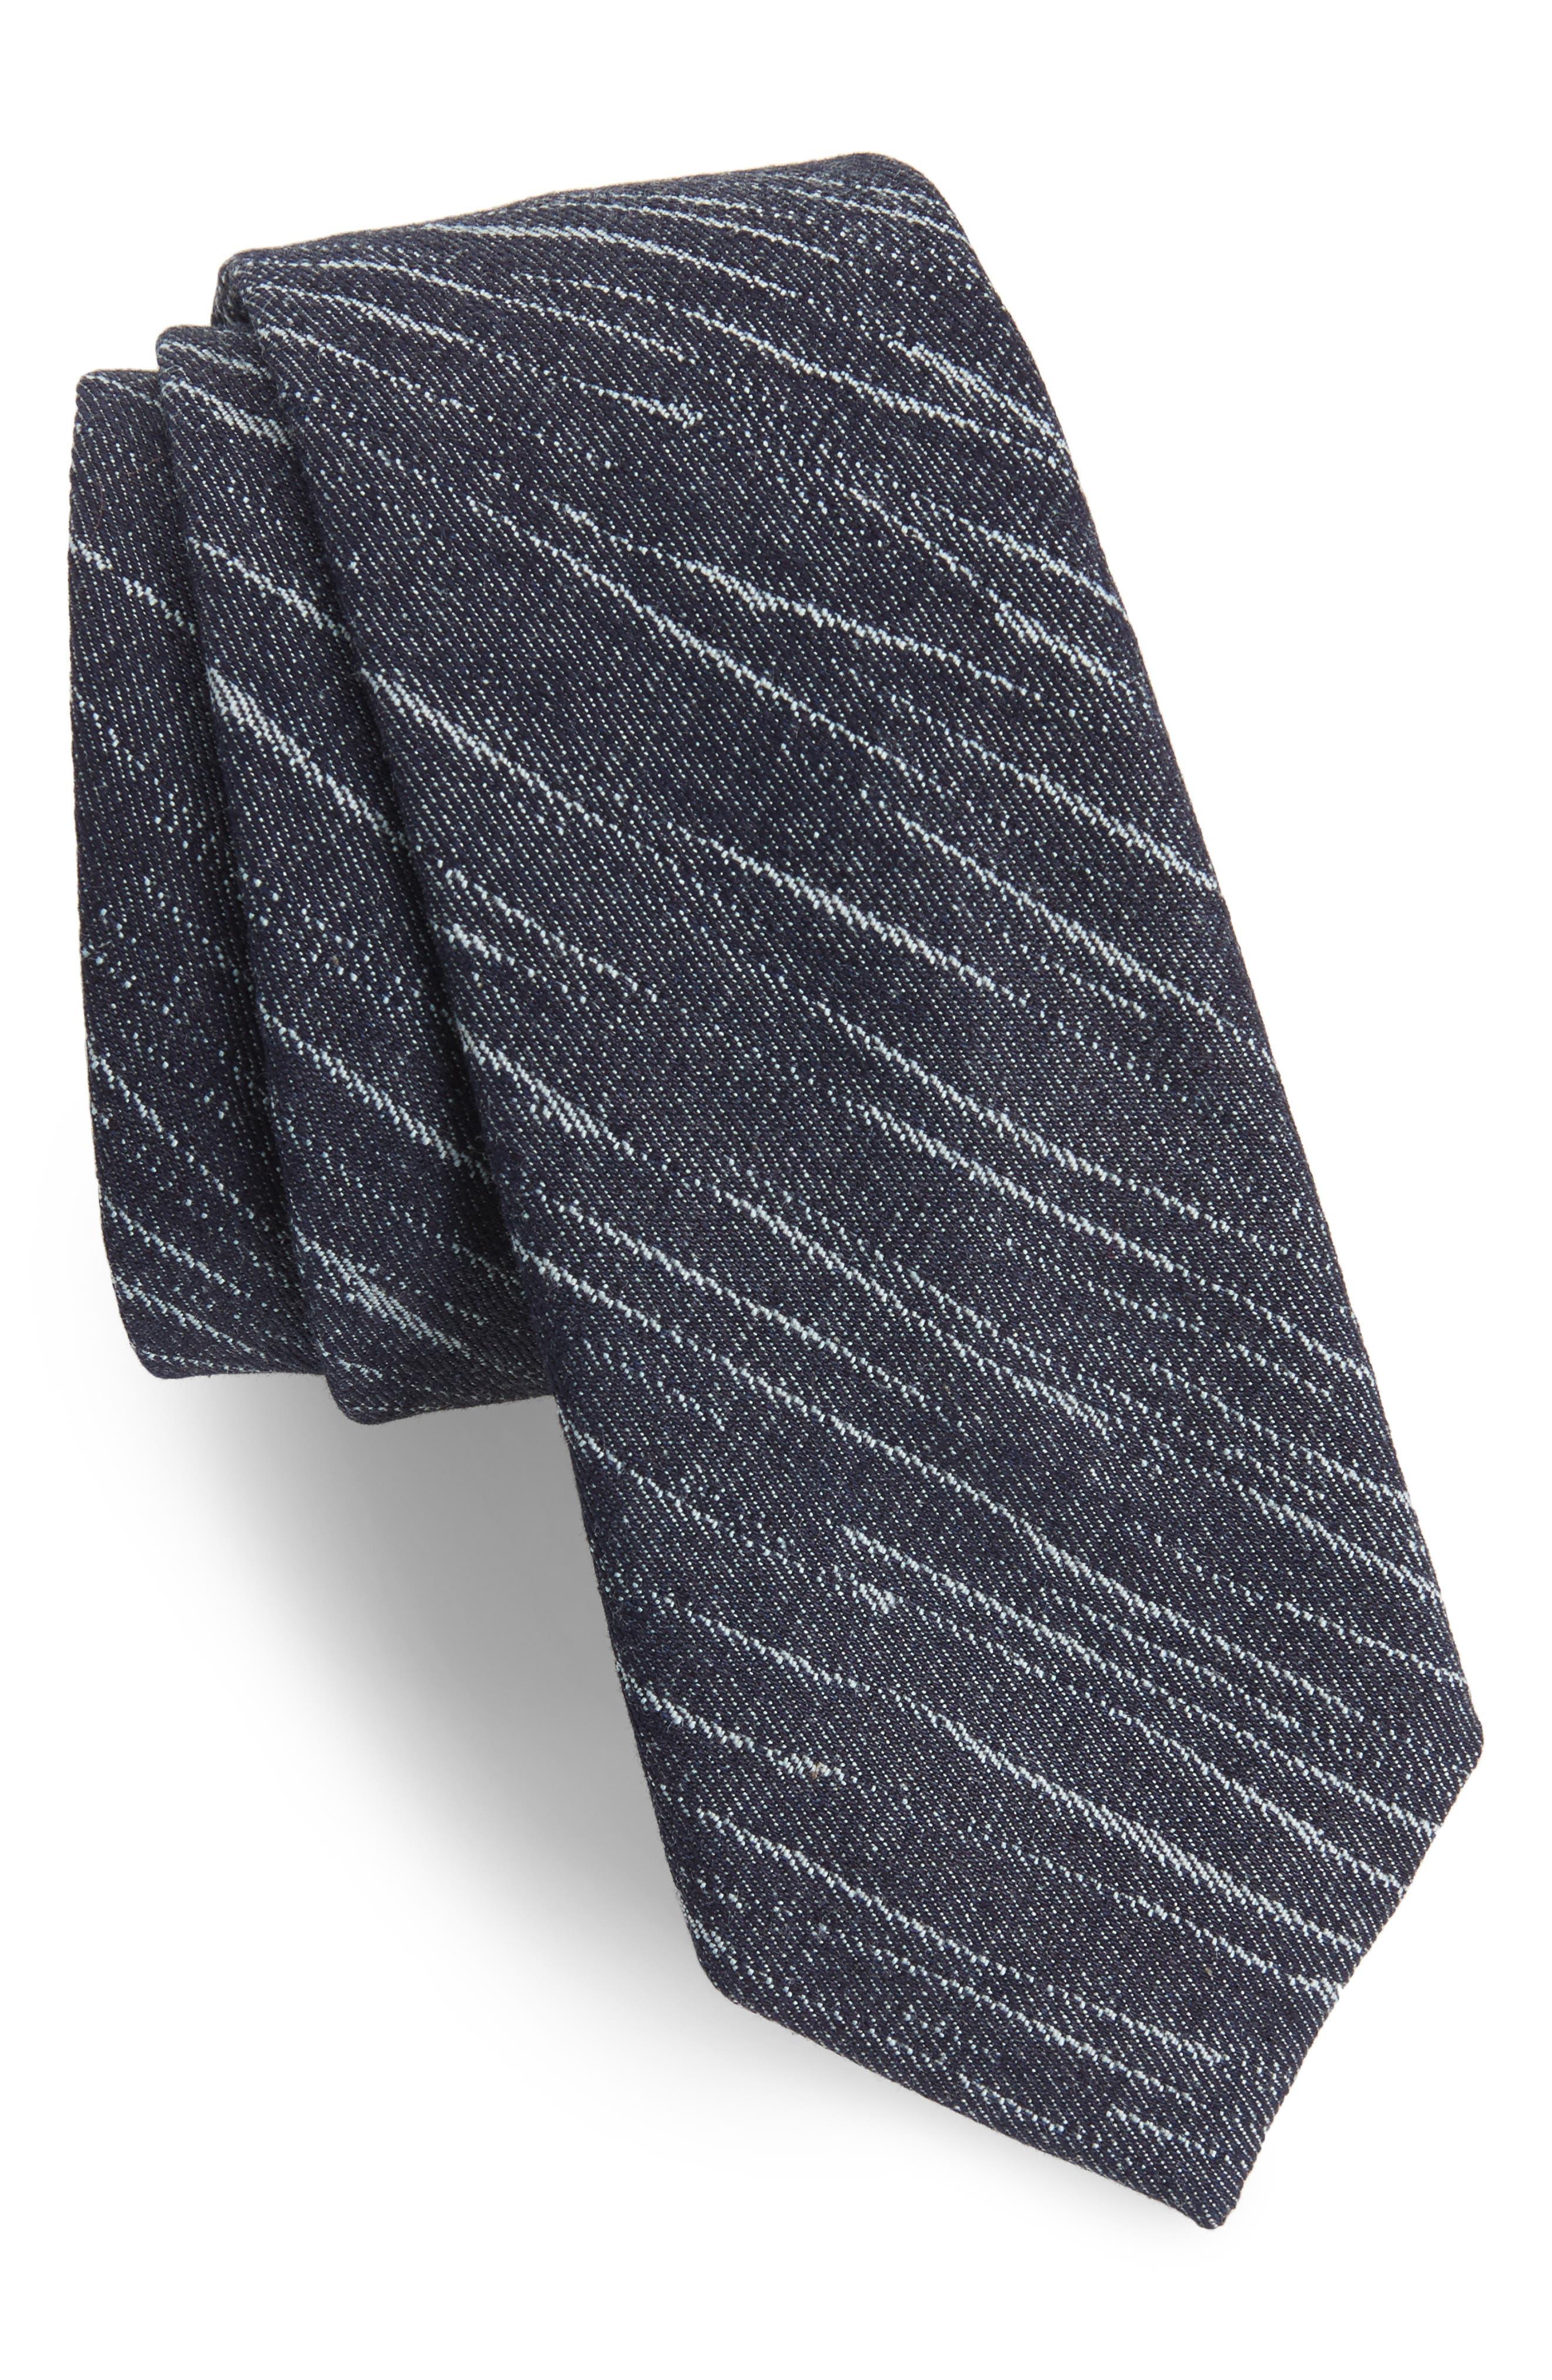 Patchwork Denim Skinny Tie,                         Main,                         color, Denim